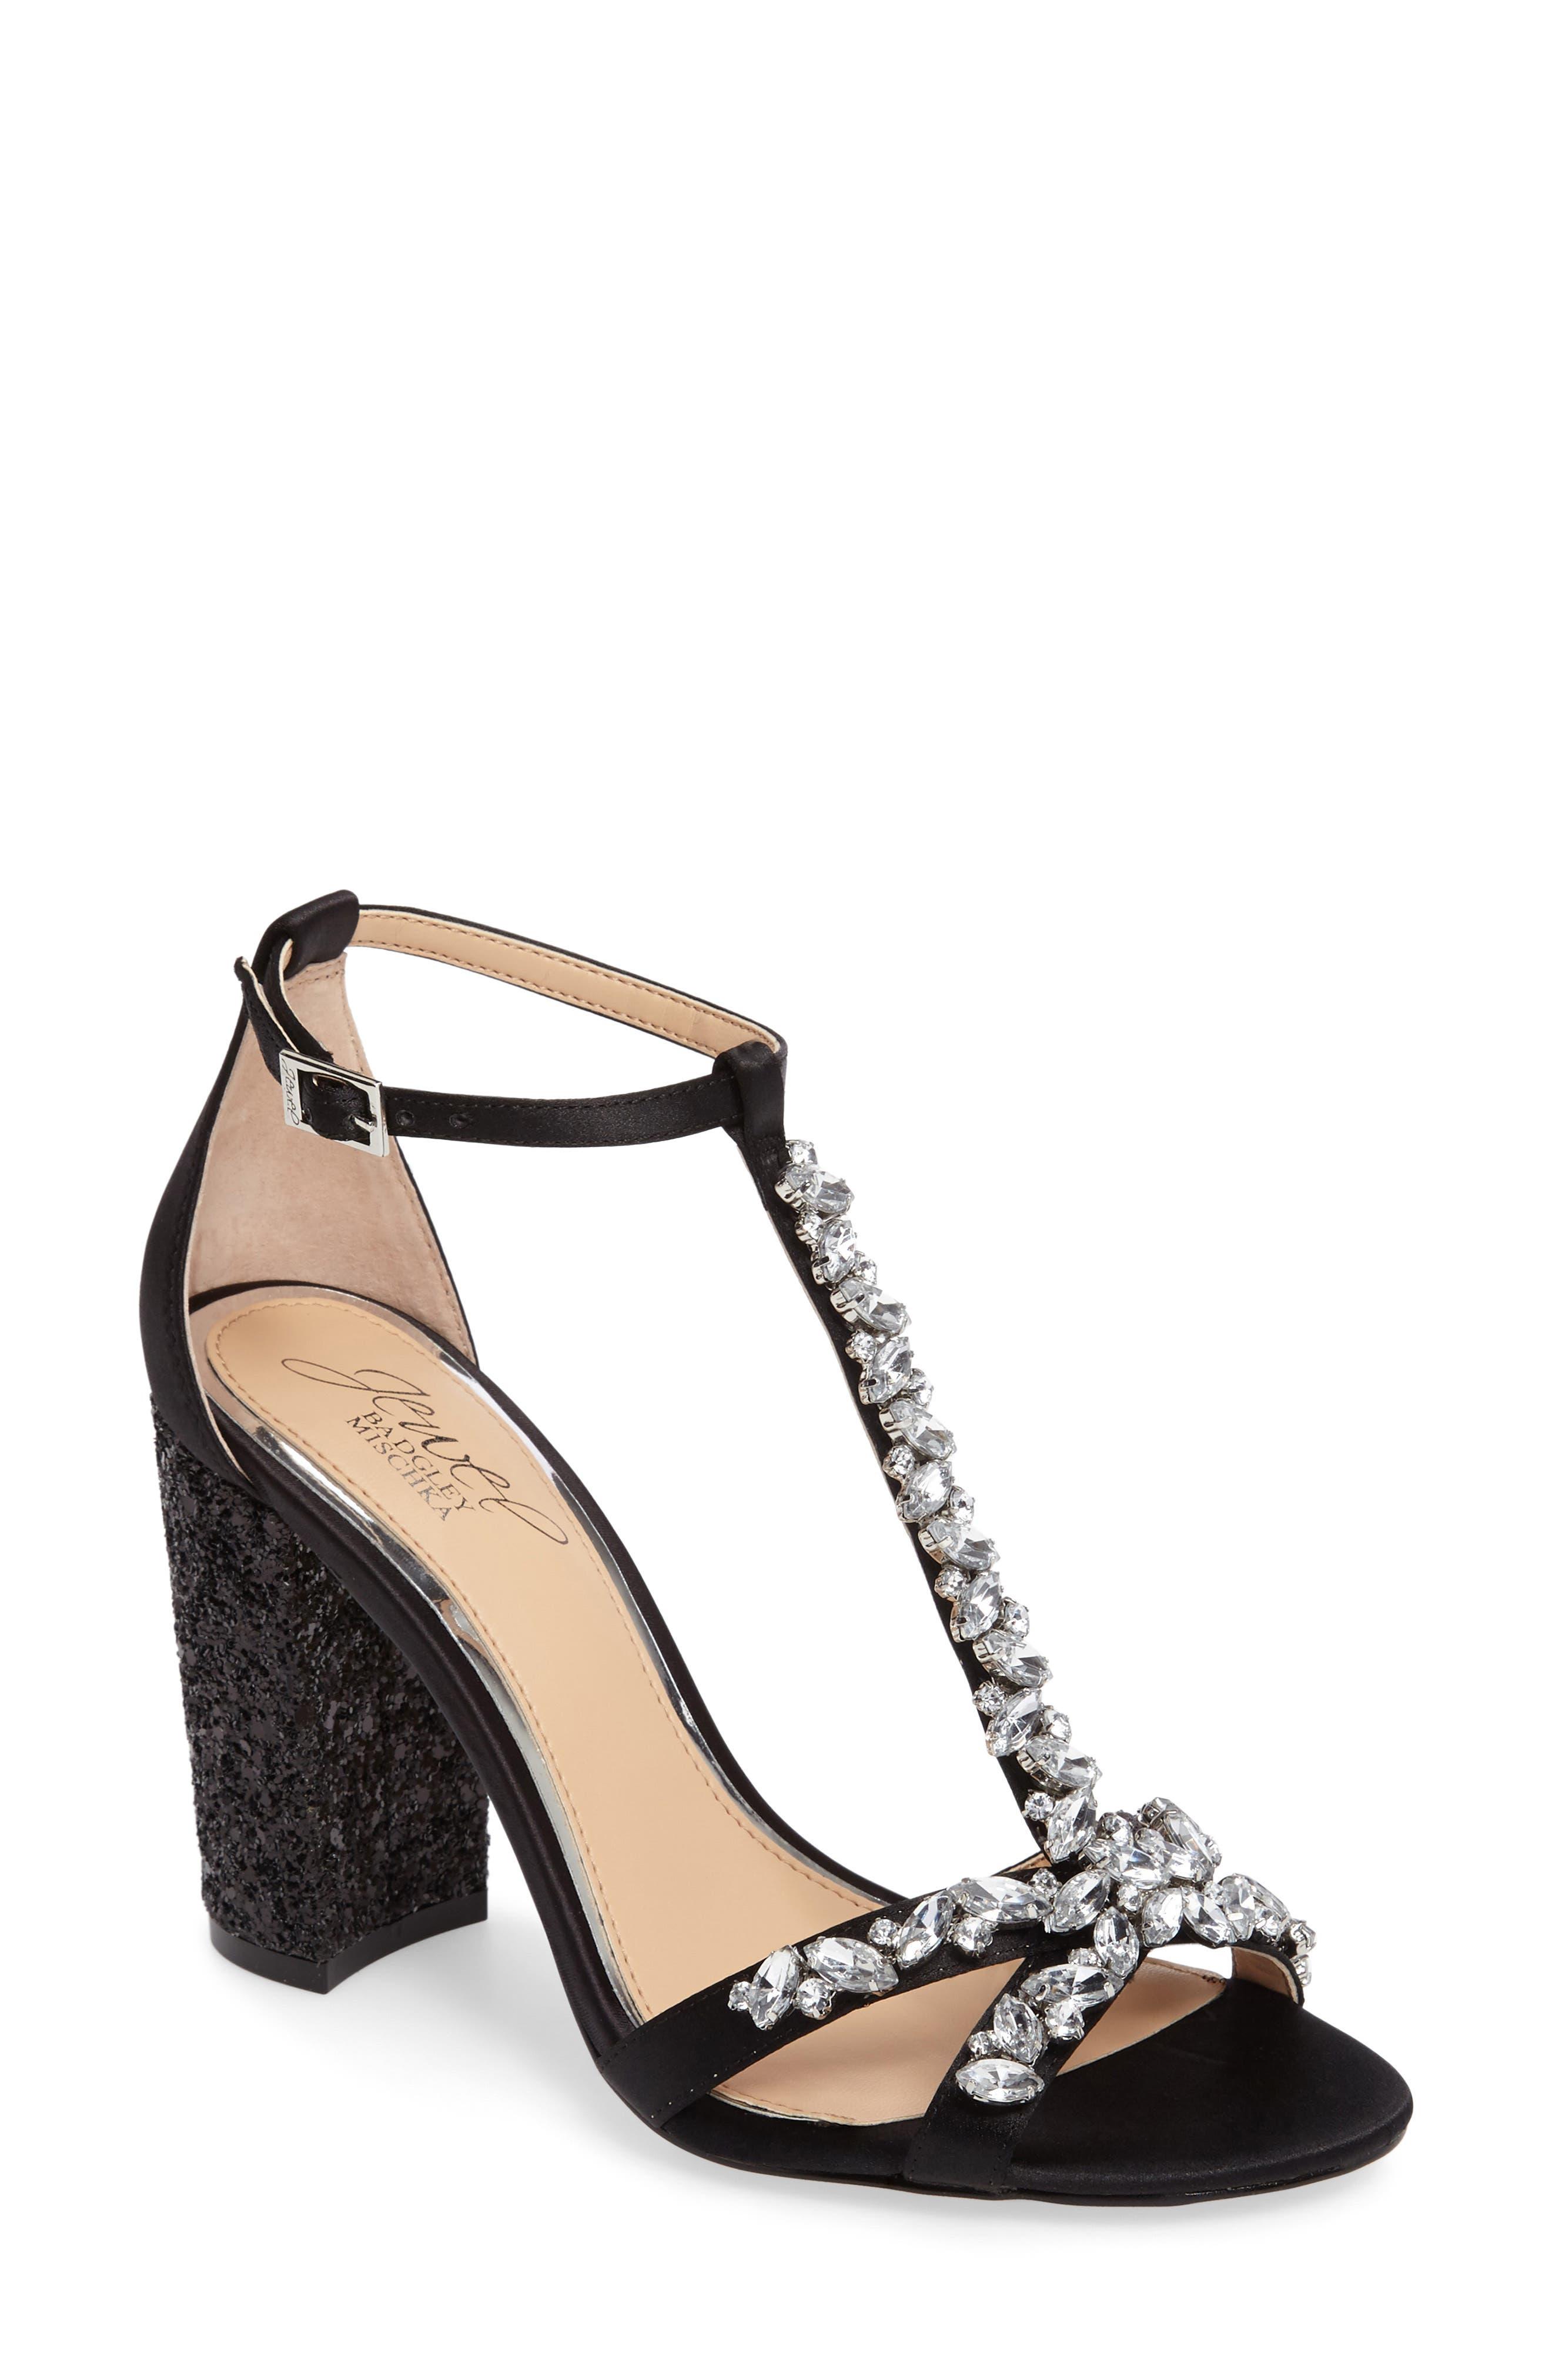 Carver Block Heel Sandal,                             Main thumbnail 1, color,                             Black Satin